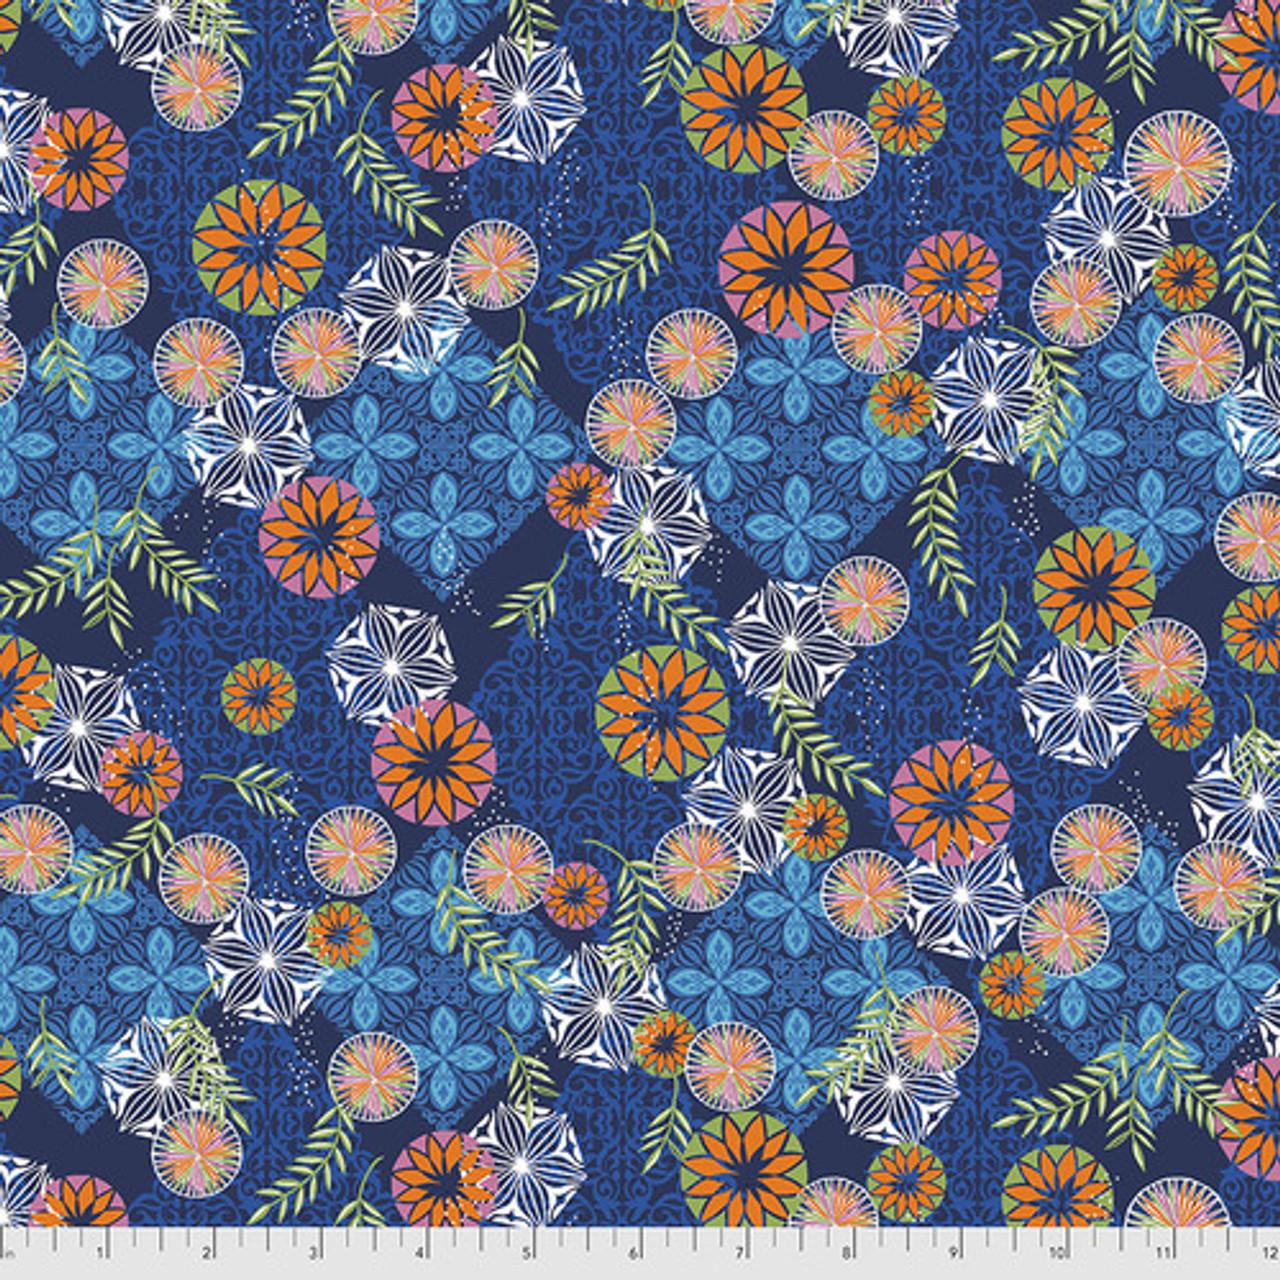 Free Spirit Valori Wells Enchanted Medallions Indigo Cotton Fabric By The Yard